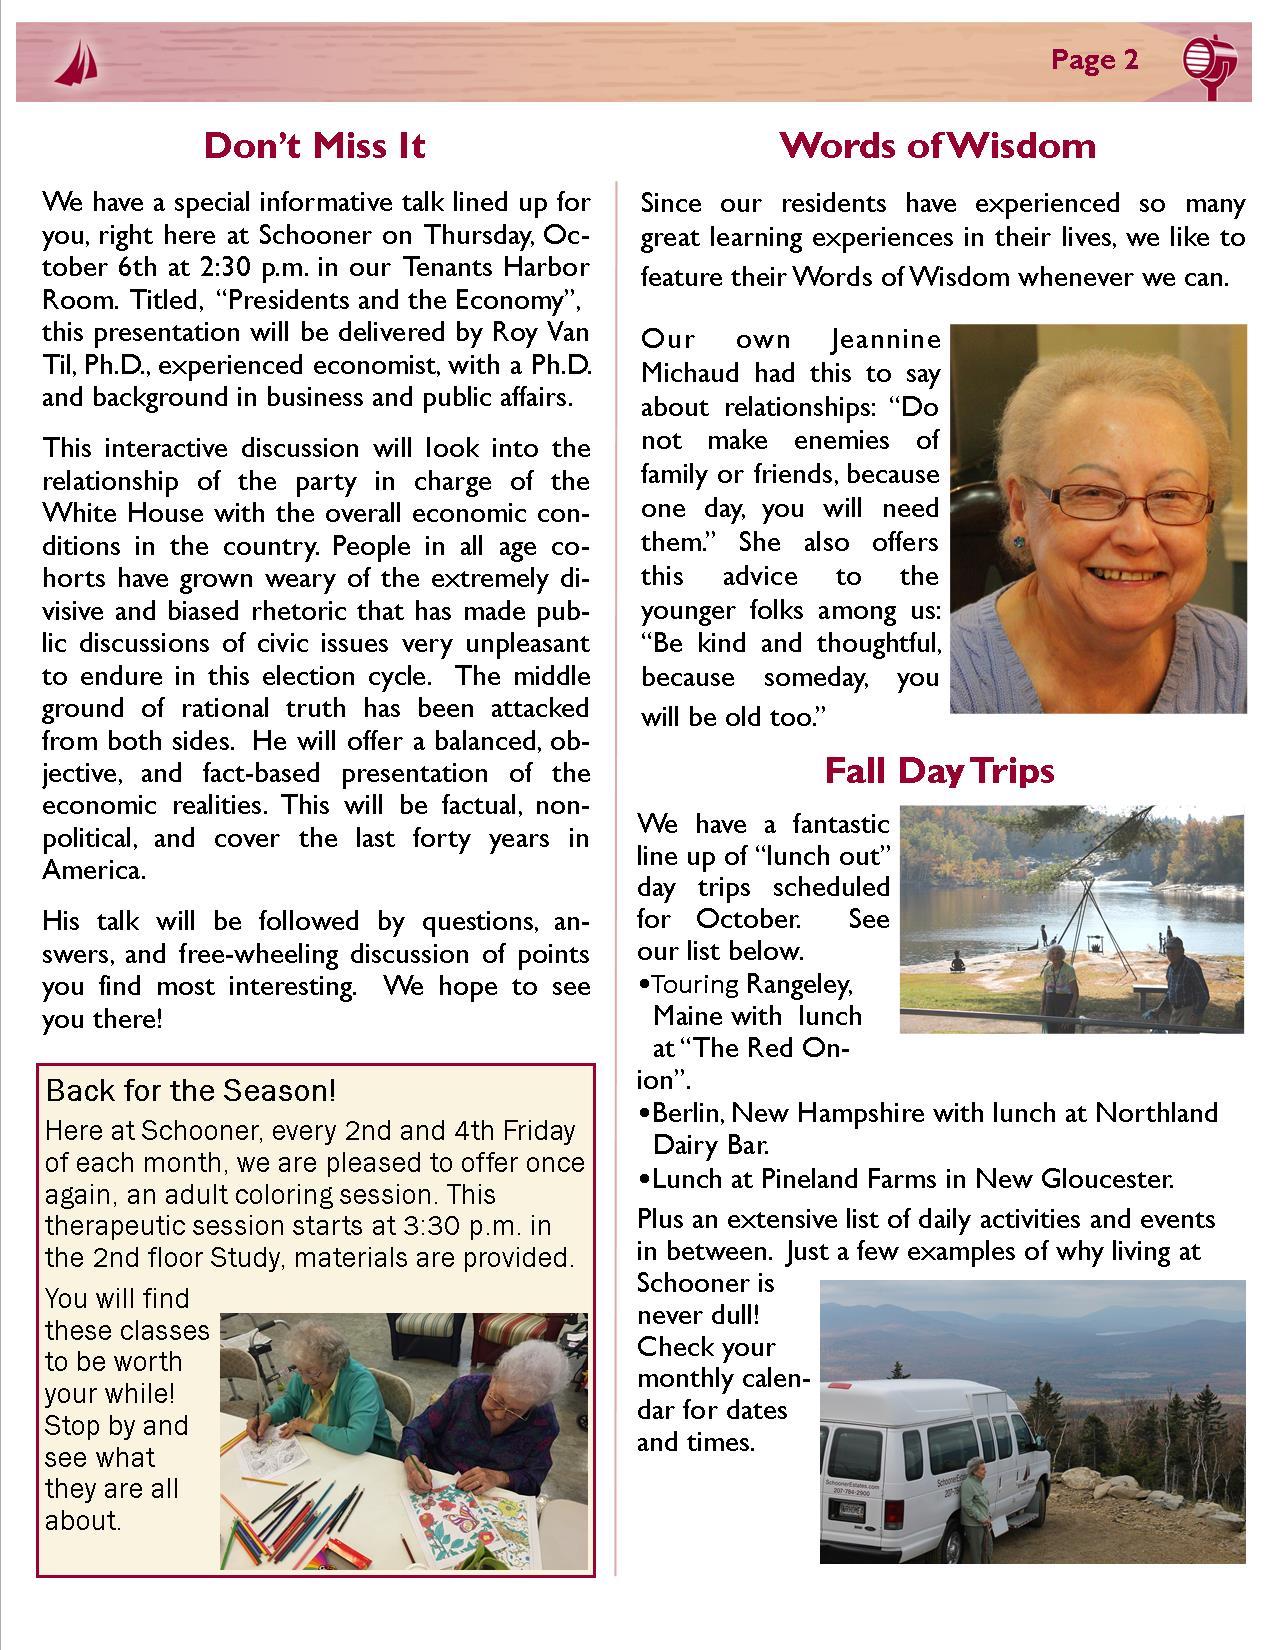 october-2015-schooner-flash-newsletter-page-2